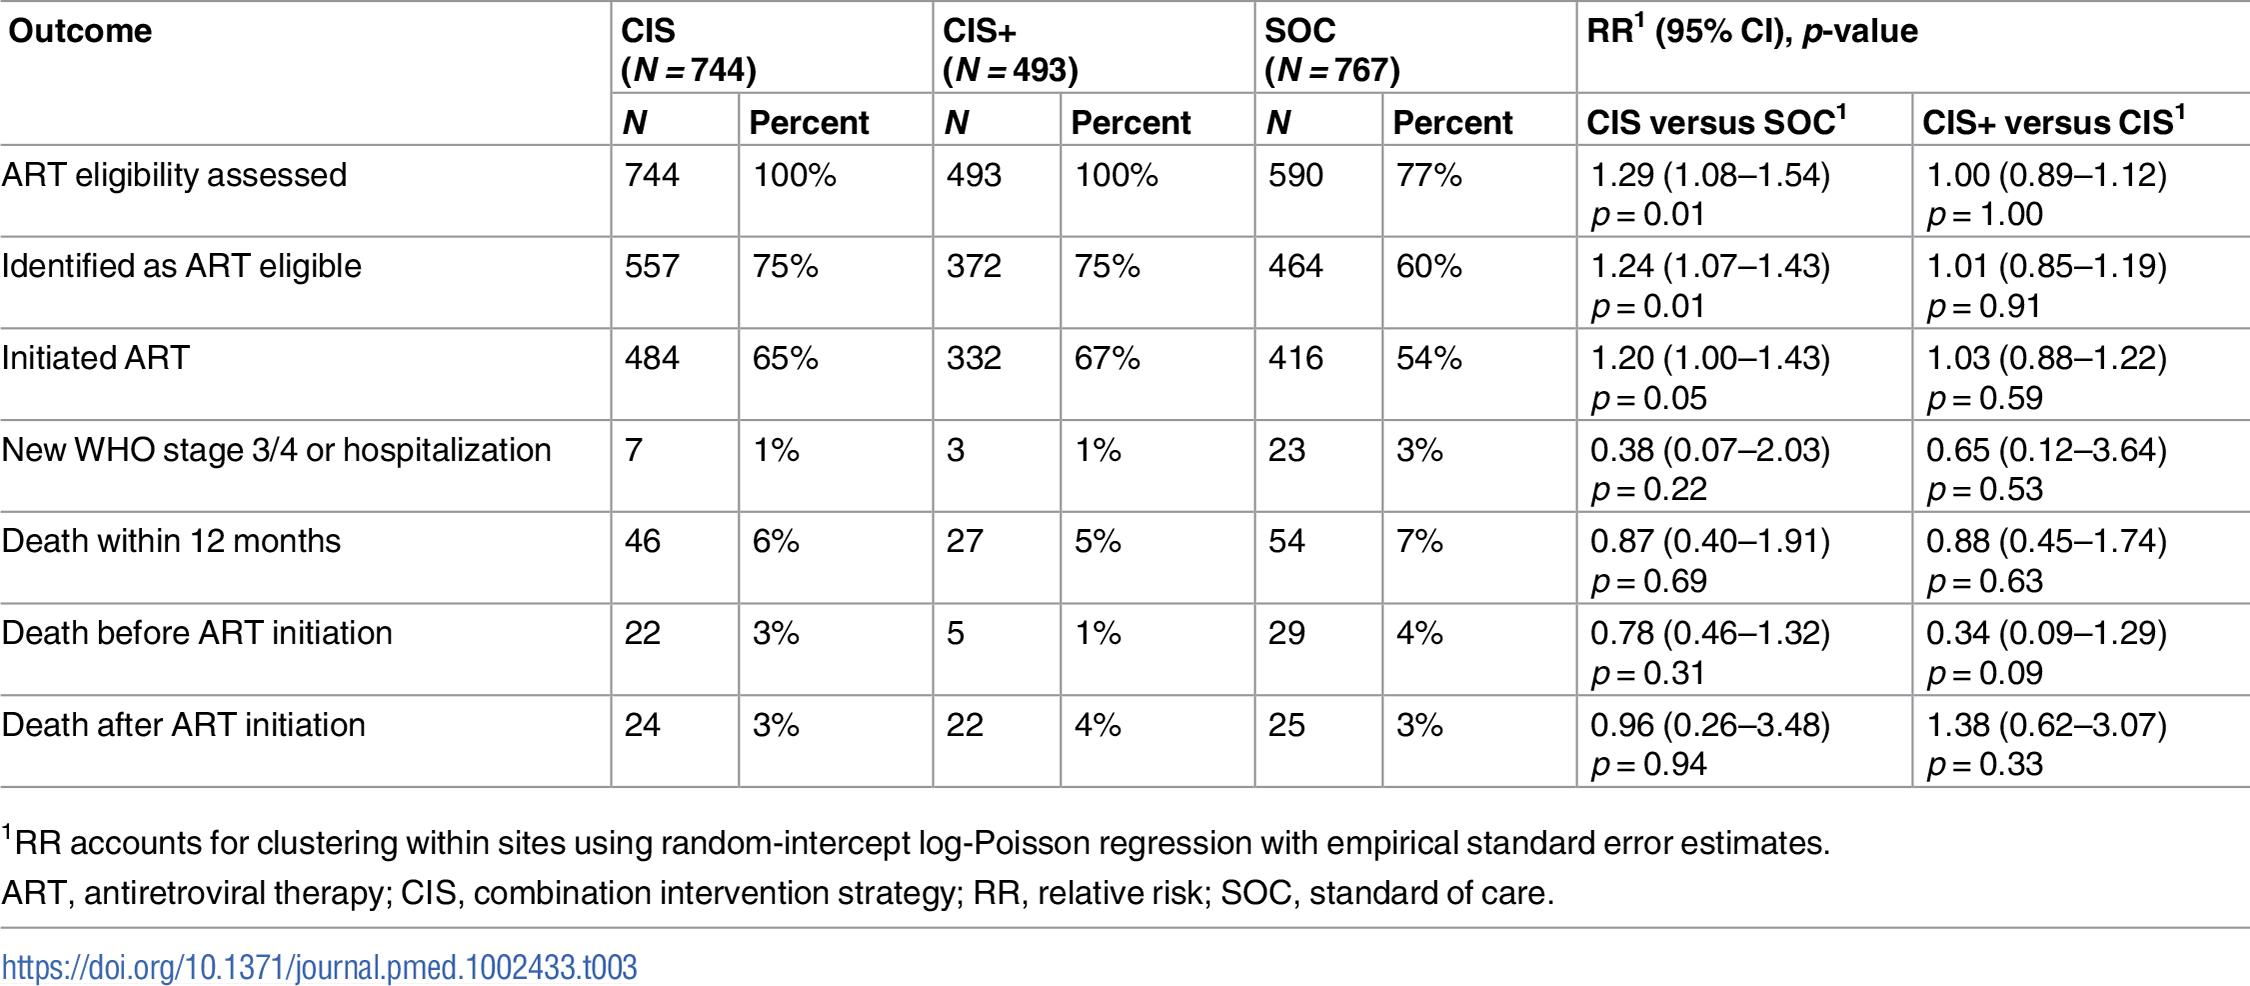 ART determination and initiation, disease progression, and death: CIS versus SOC and CIS+ versus CIS.